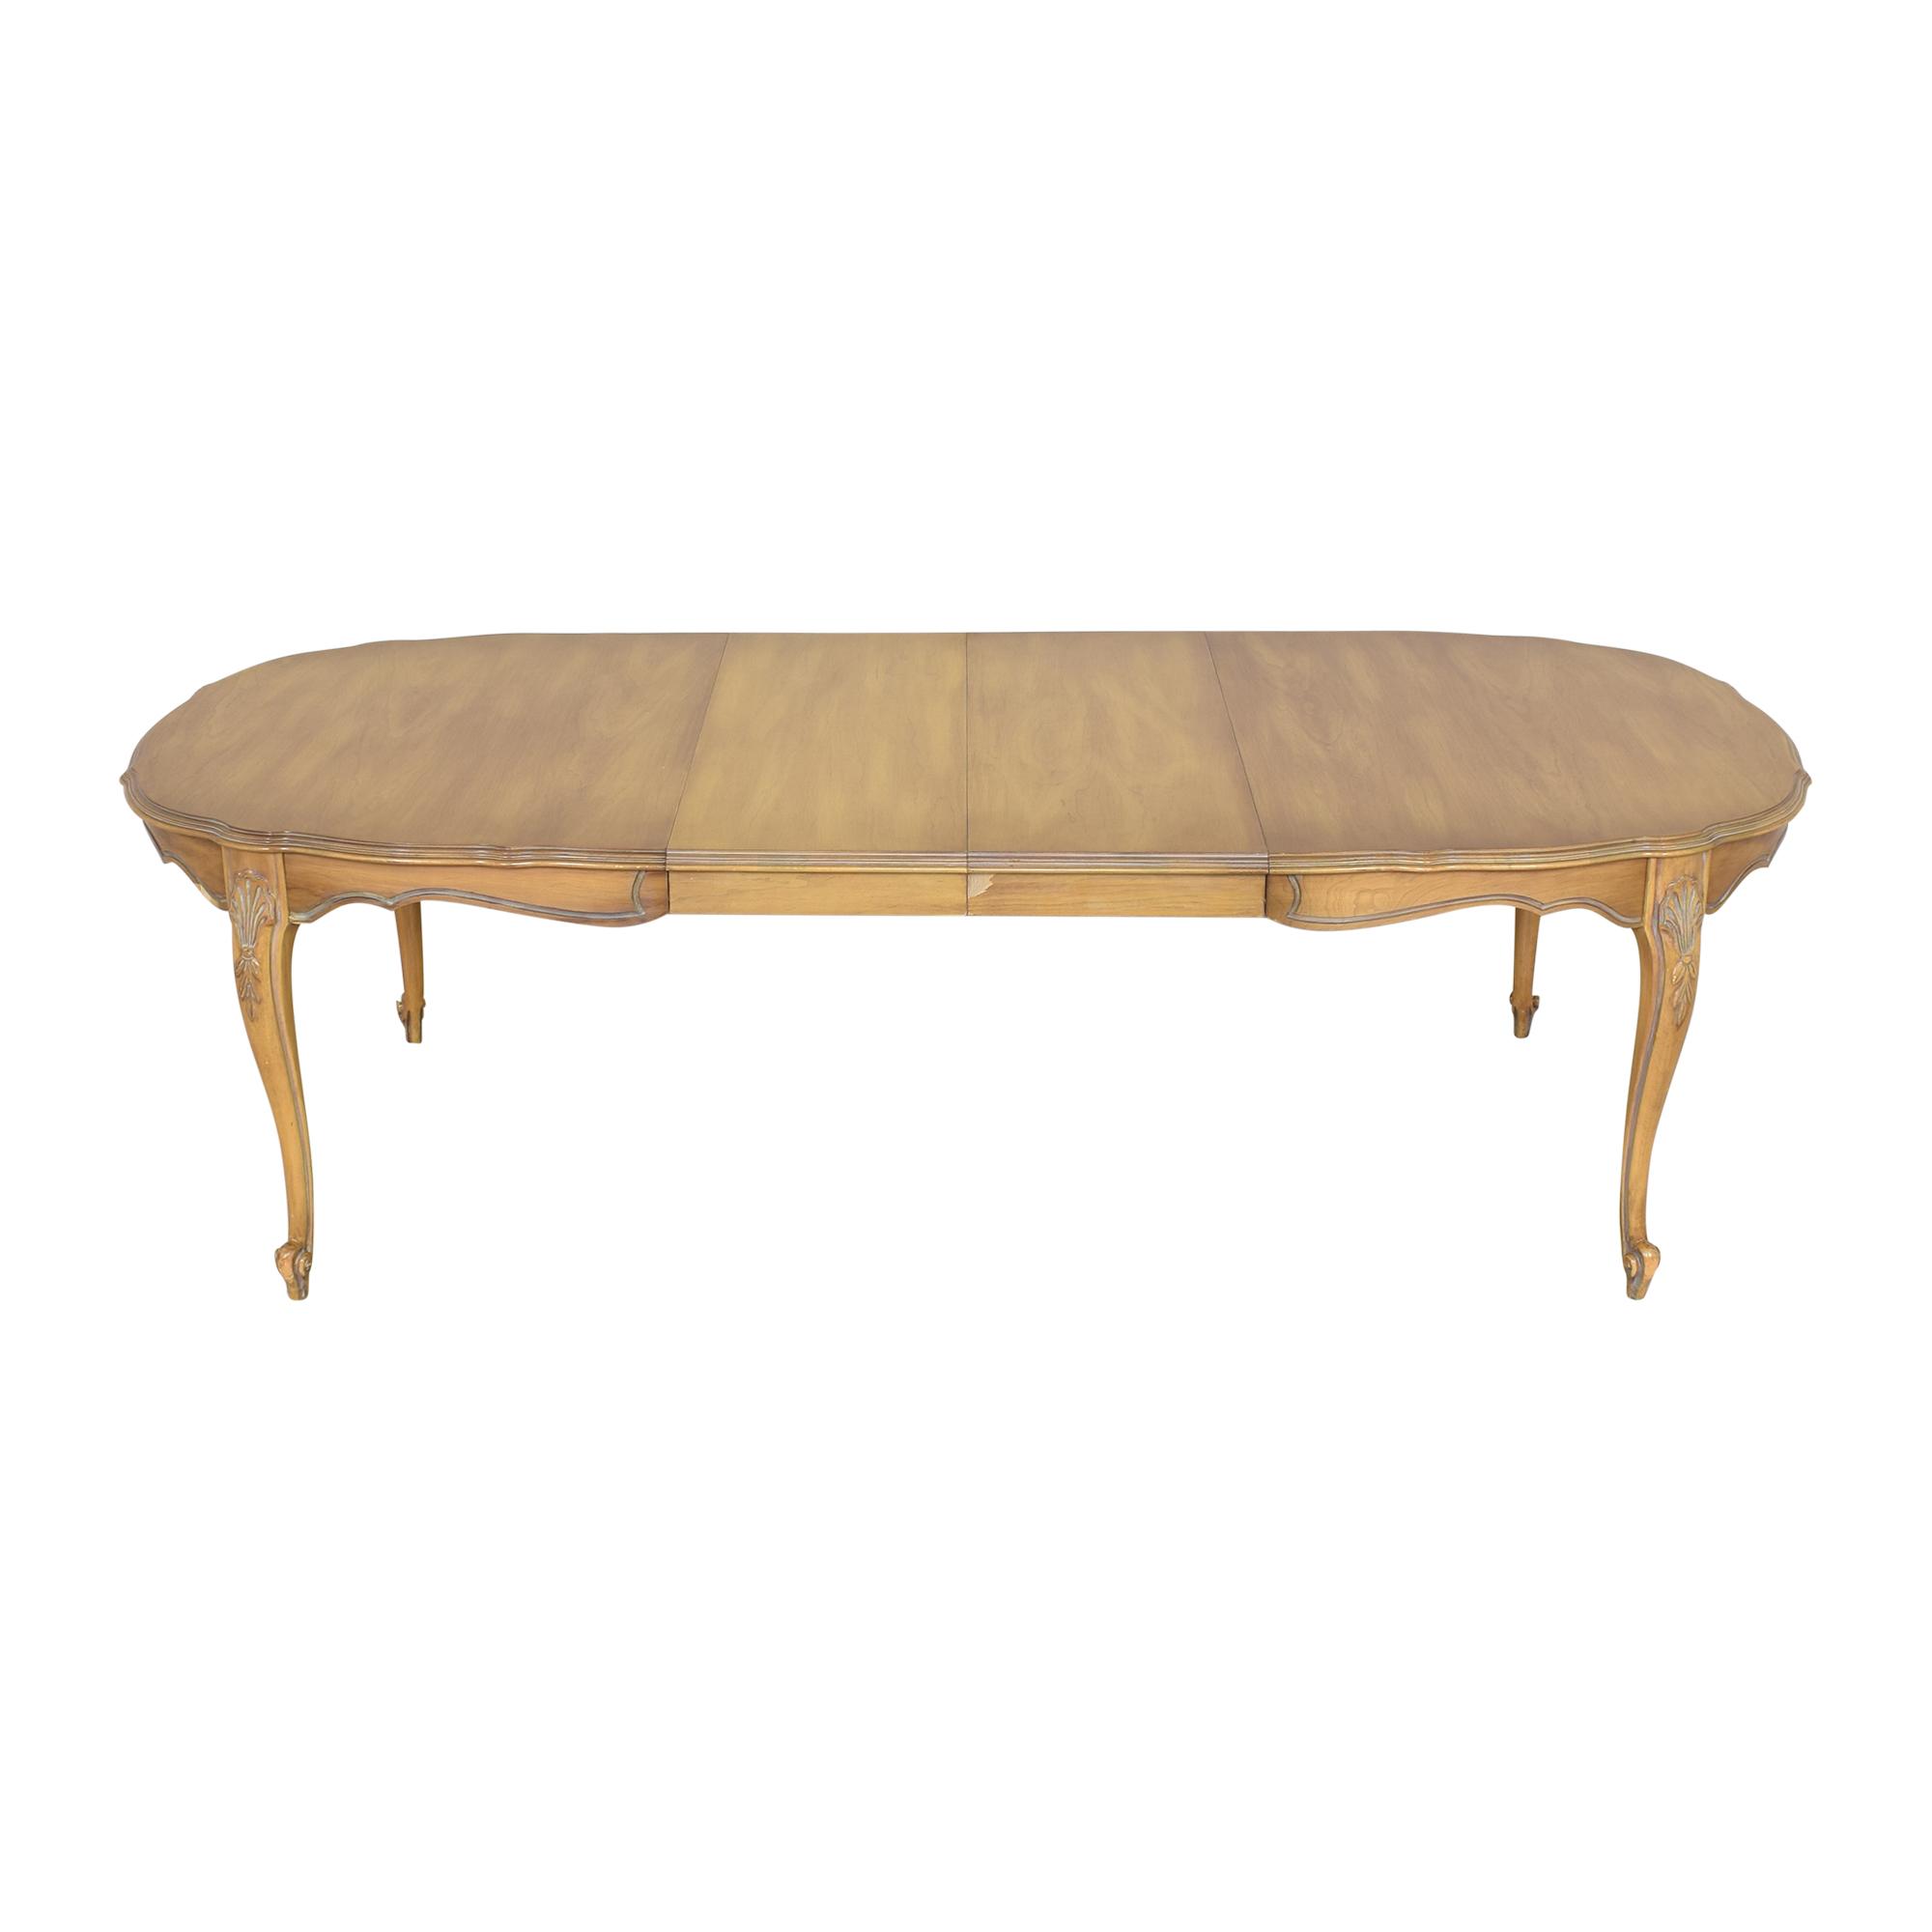 White Fine Furniture White Fine Furniture Extendable Dining Table price